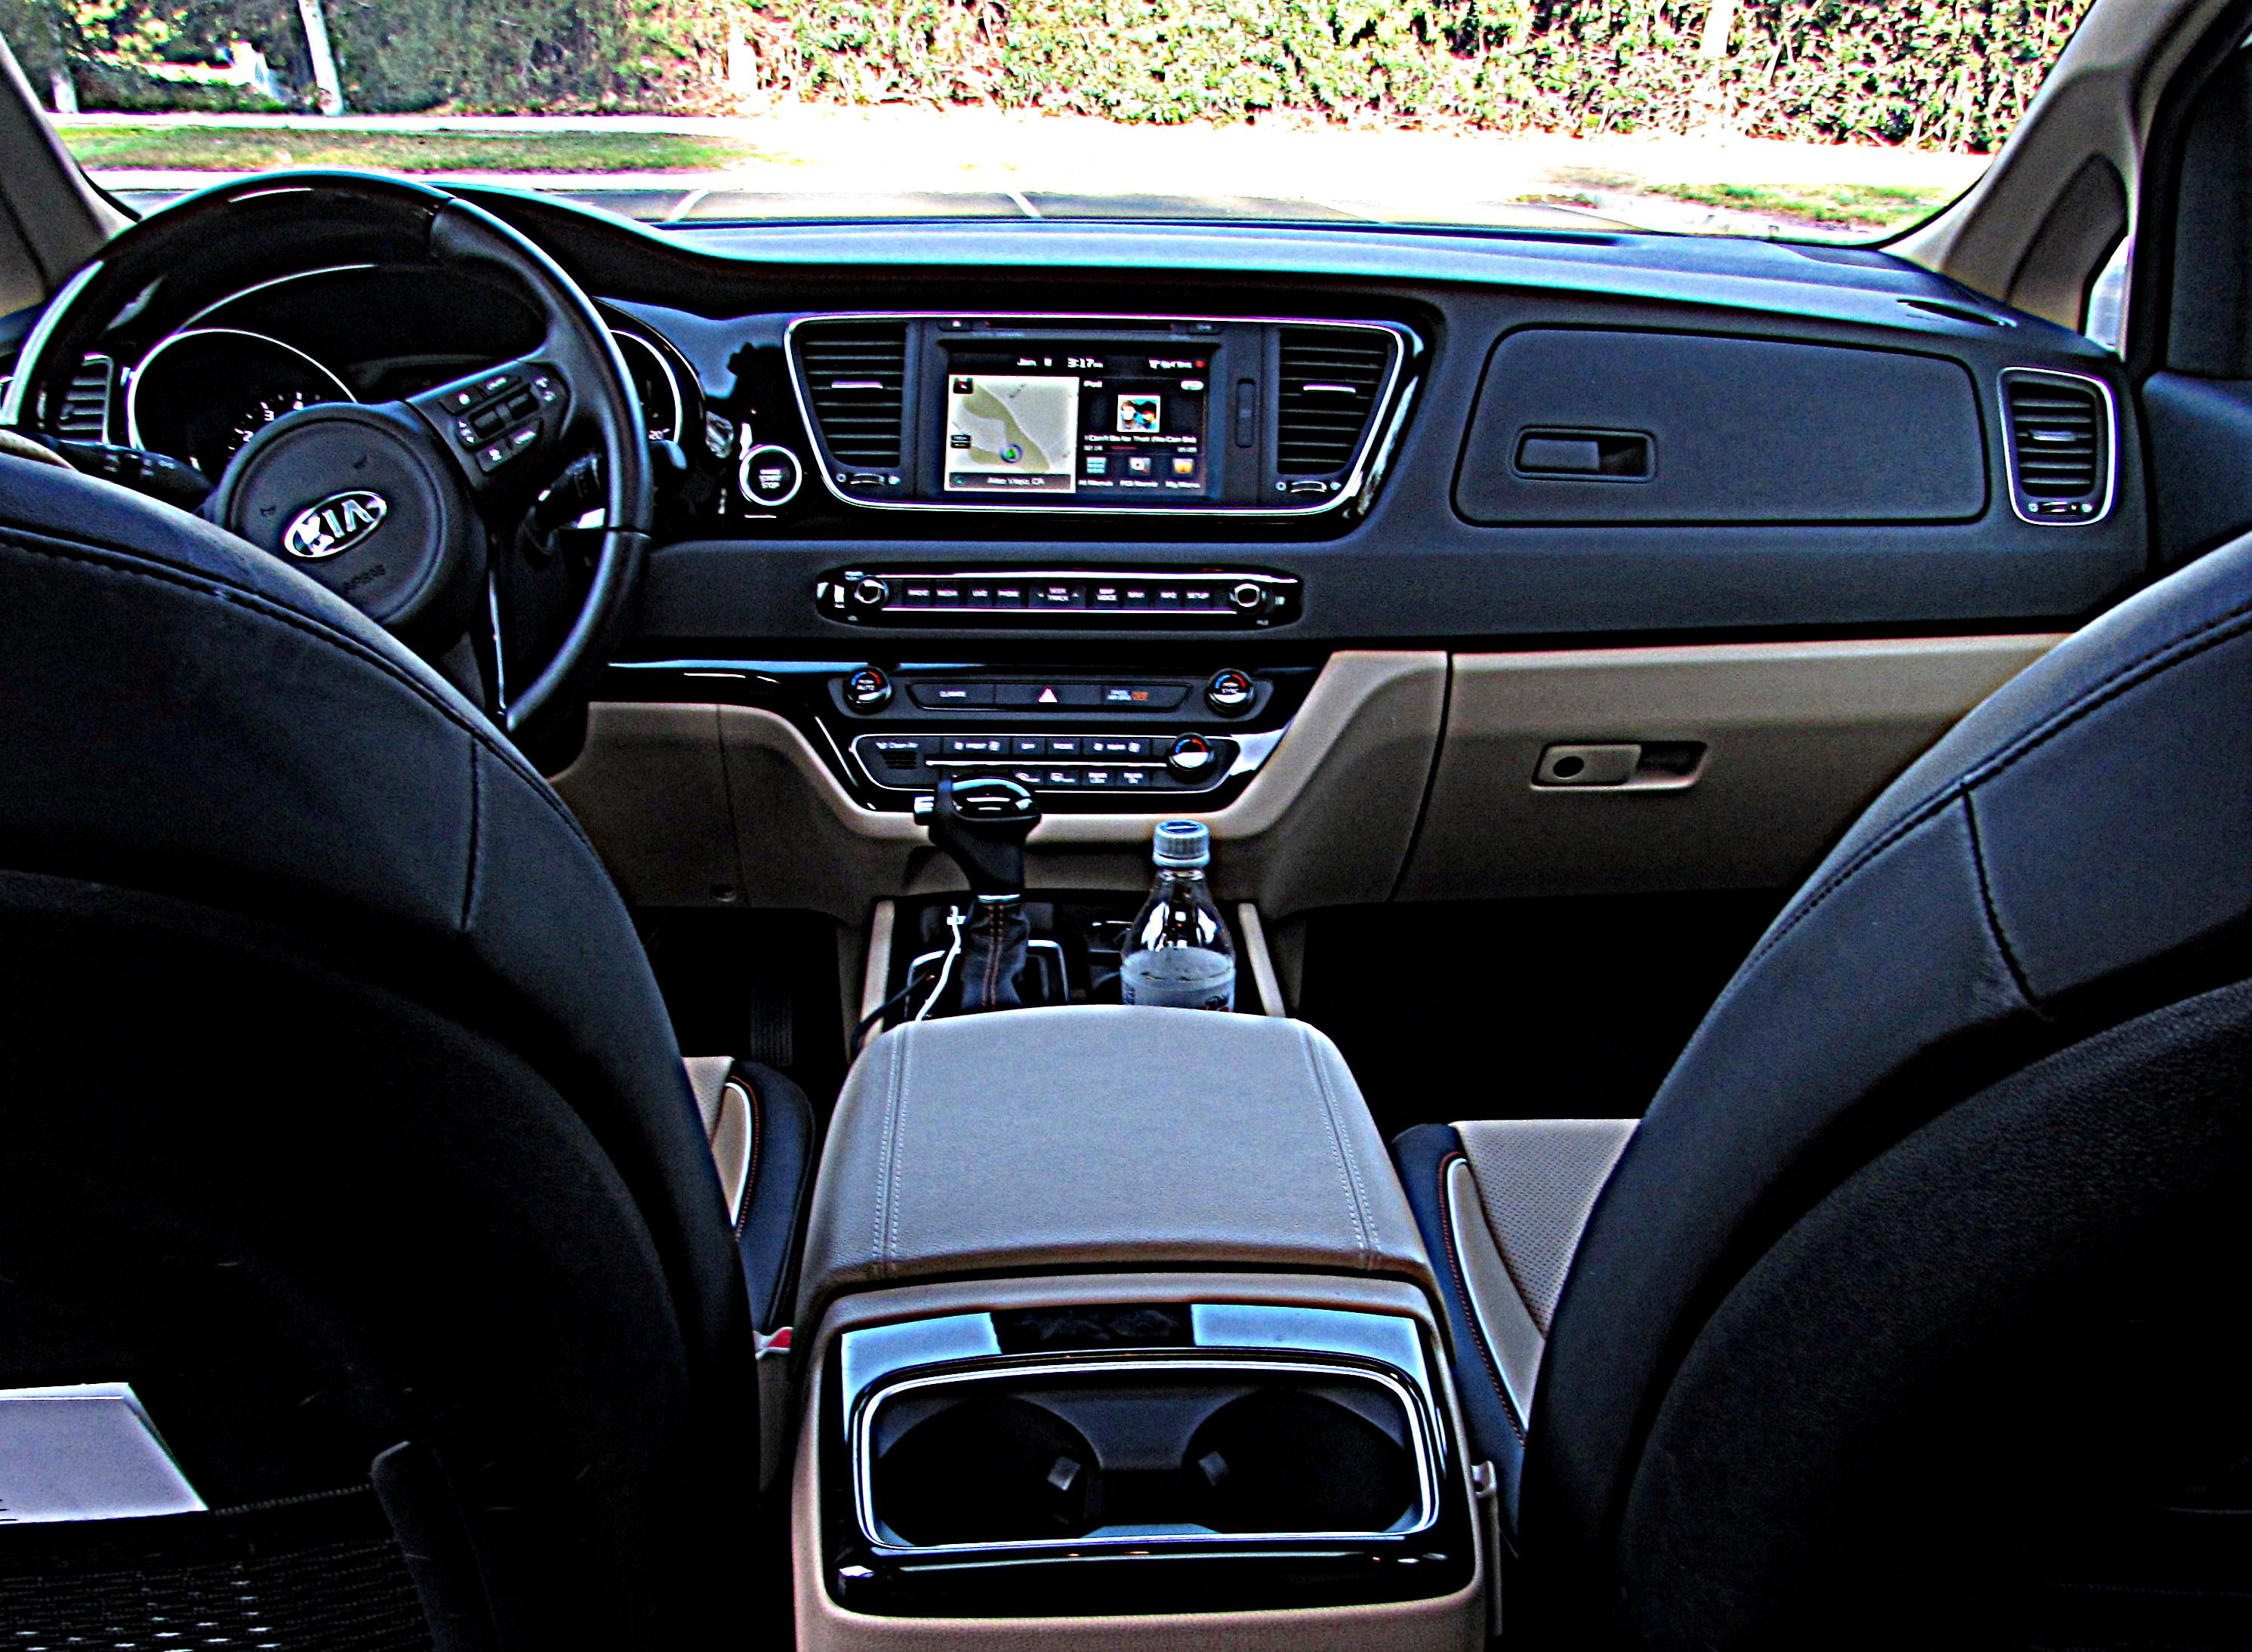 dsc fast ex sedona a hauler kia redesigned kid lane minivan car the review